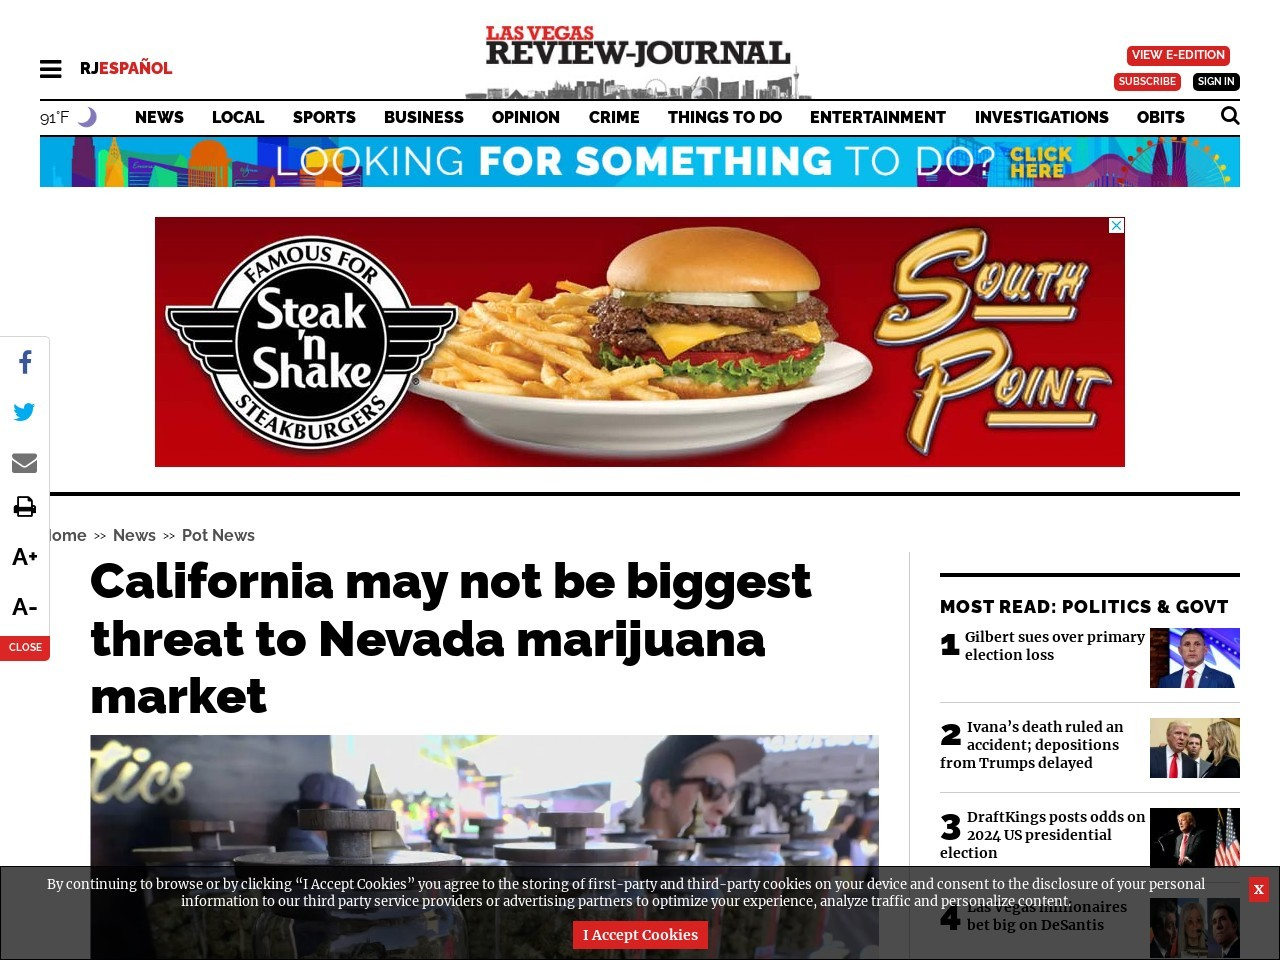 California may not be biggest threat to Nevada marijuana market